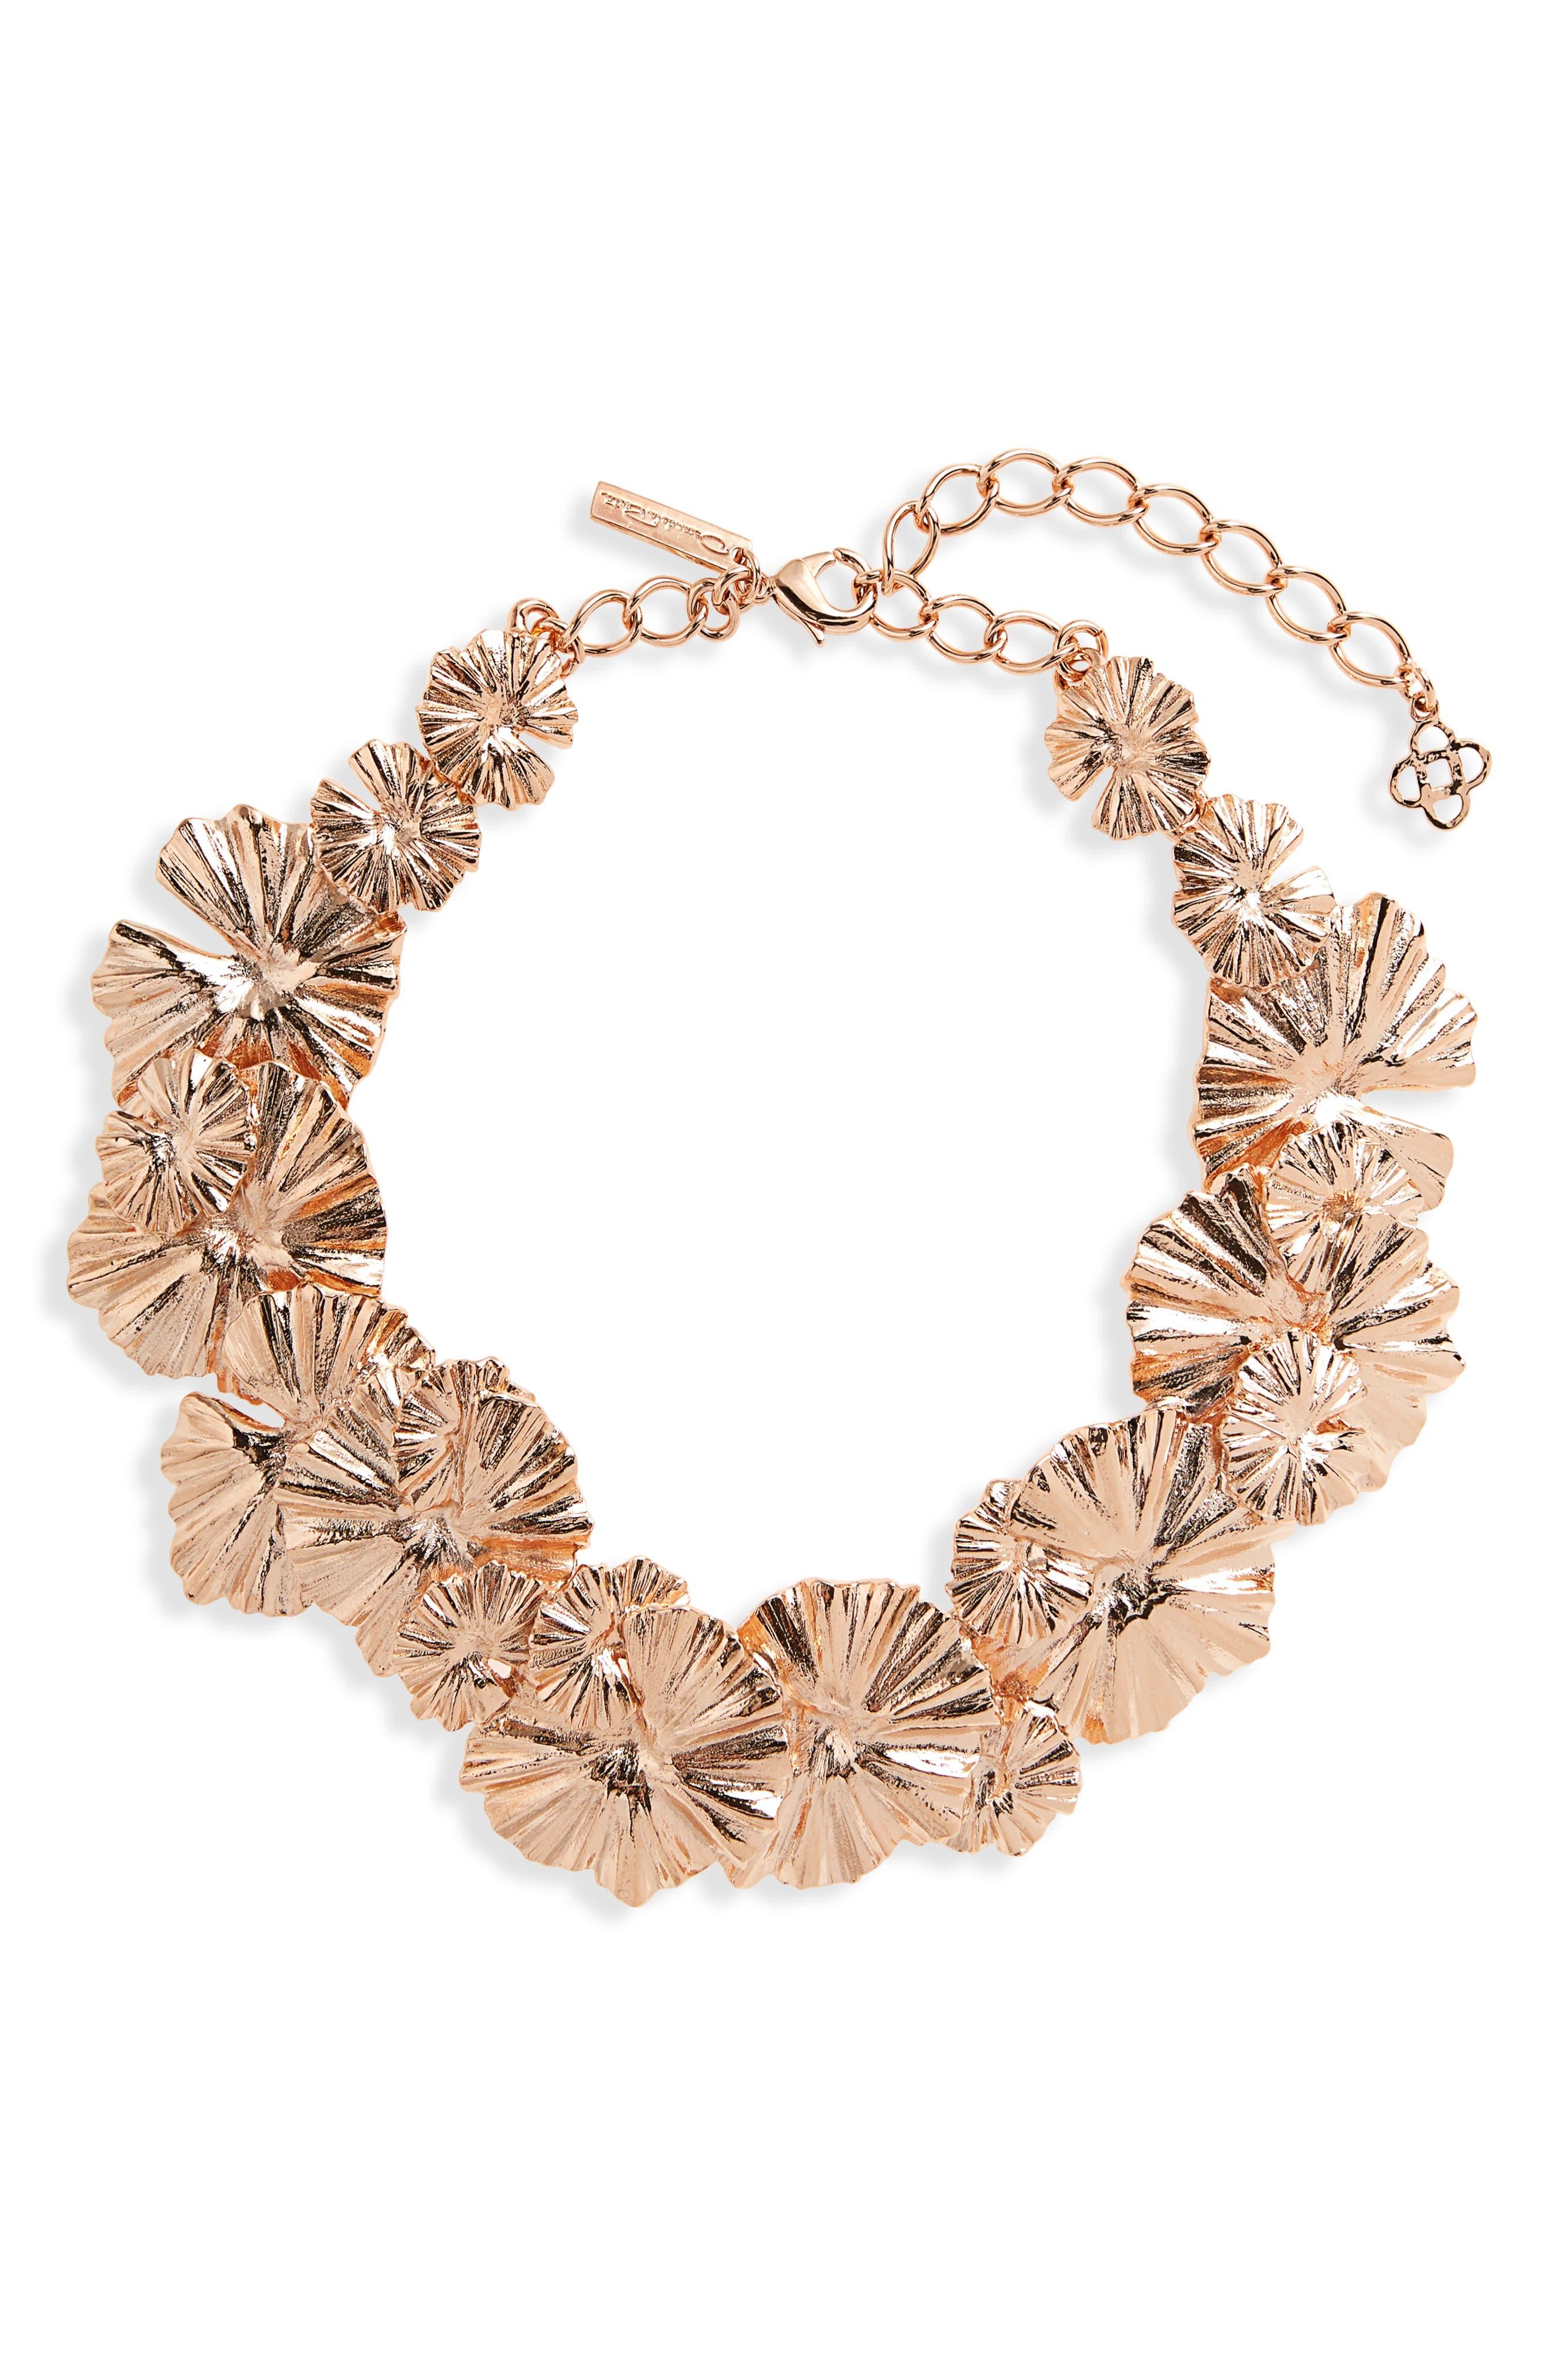 Alternate Image 1 Selected - Oscar de la Renta Wildflower Necklace